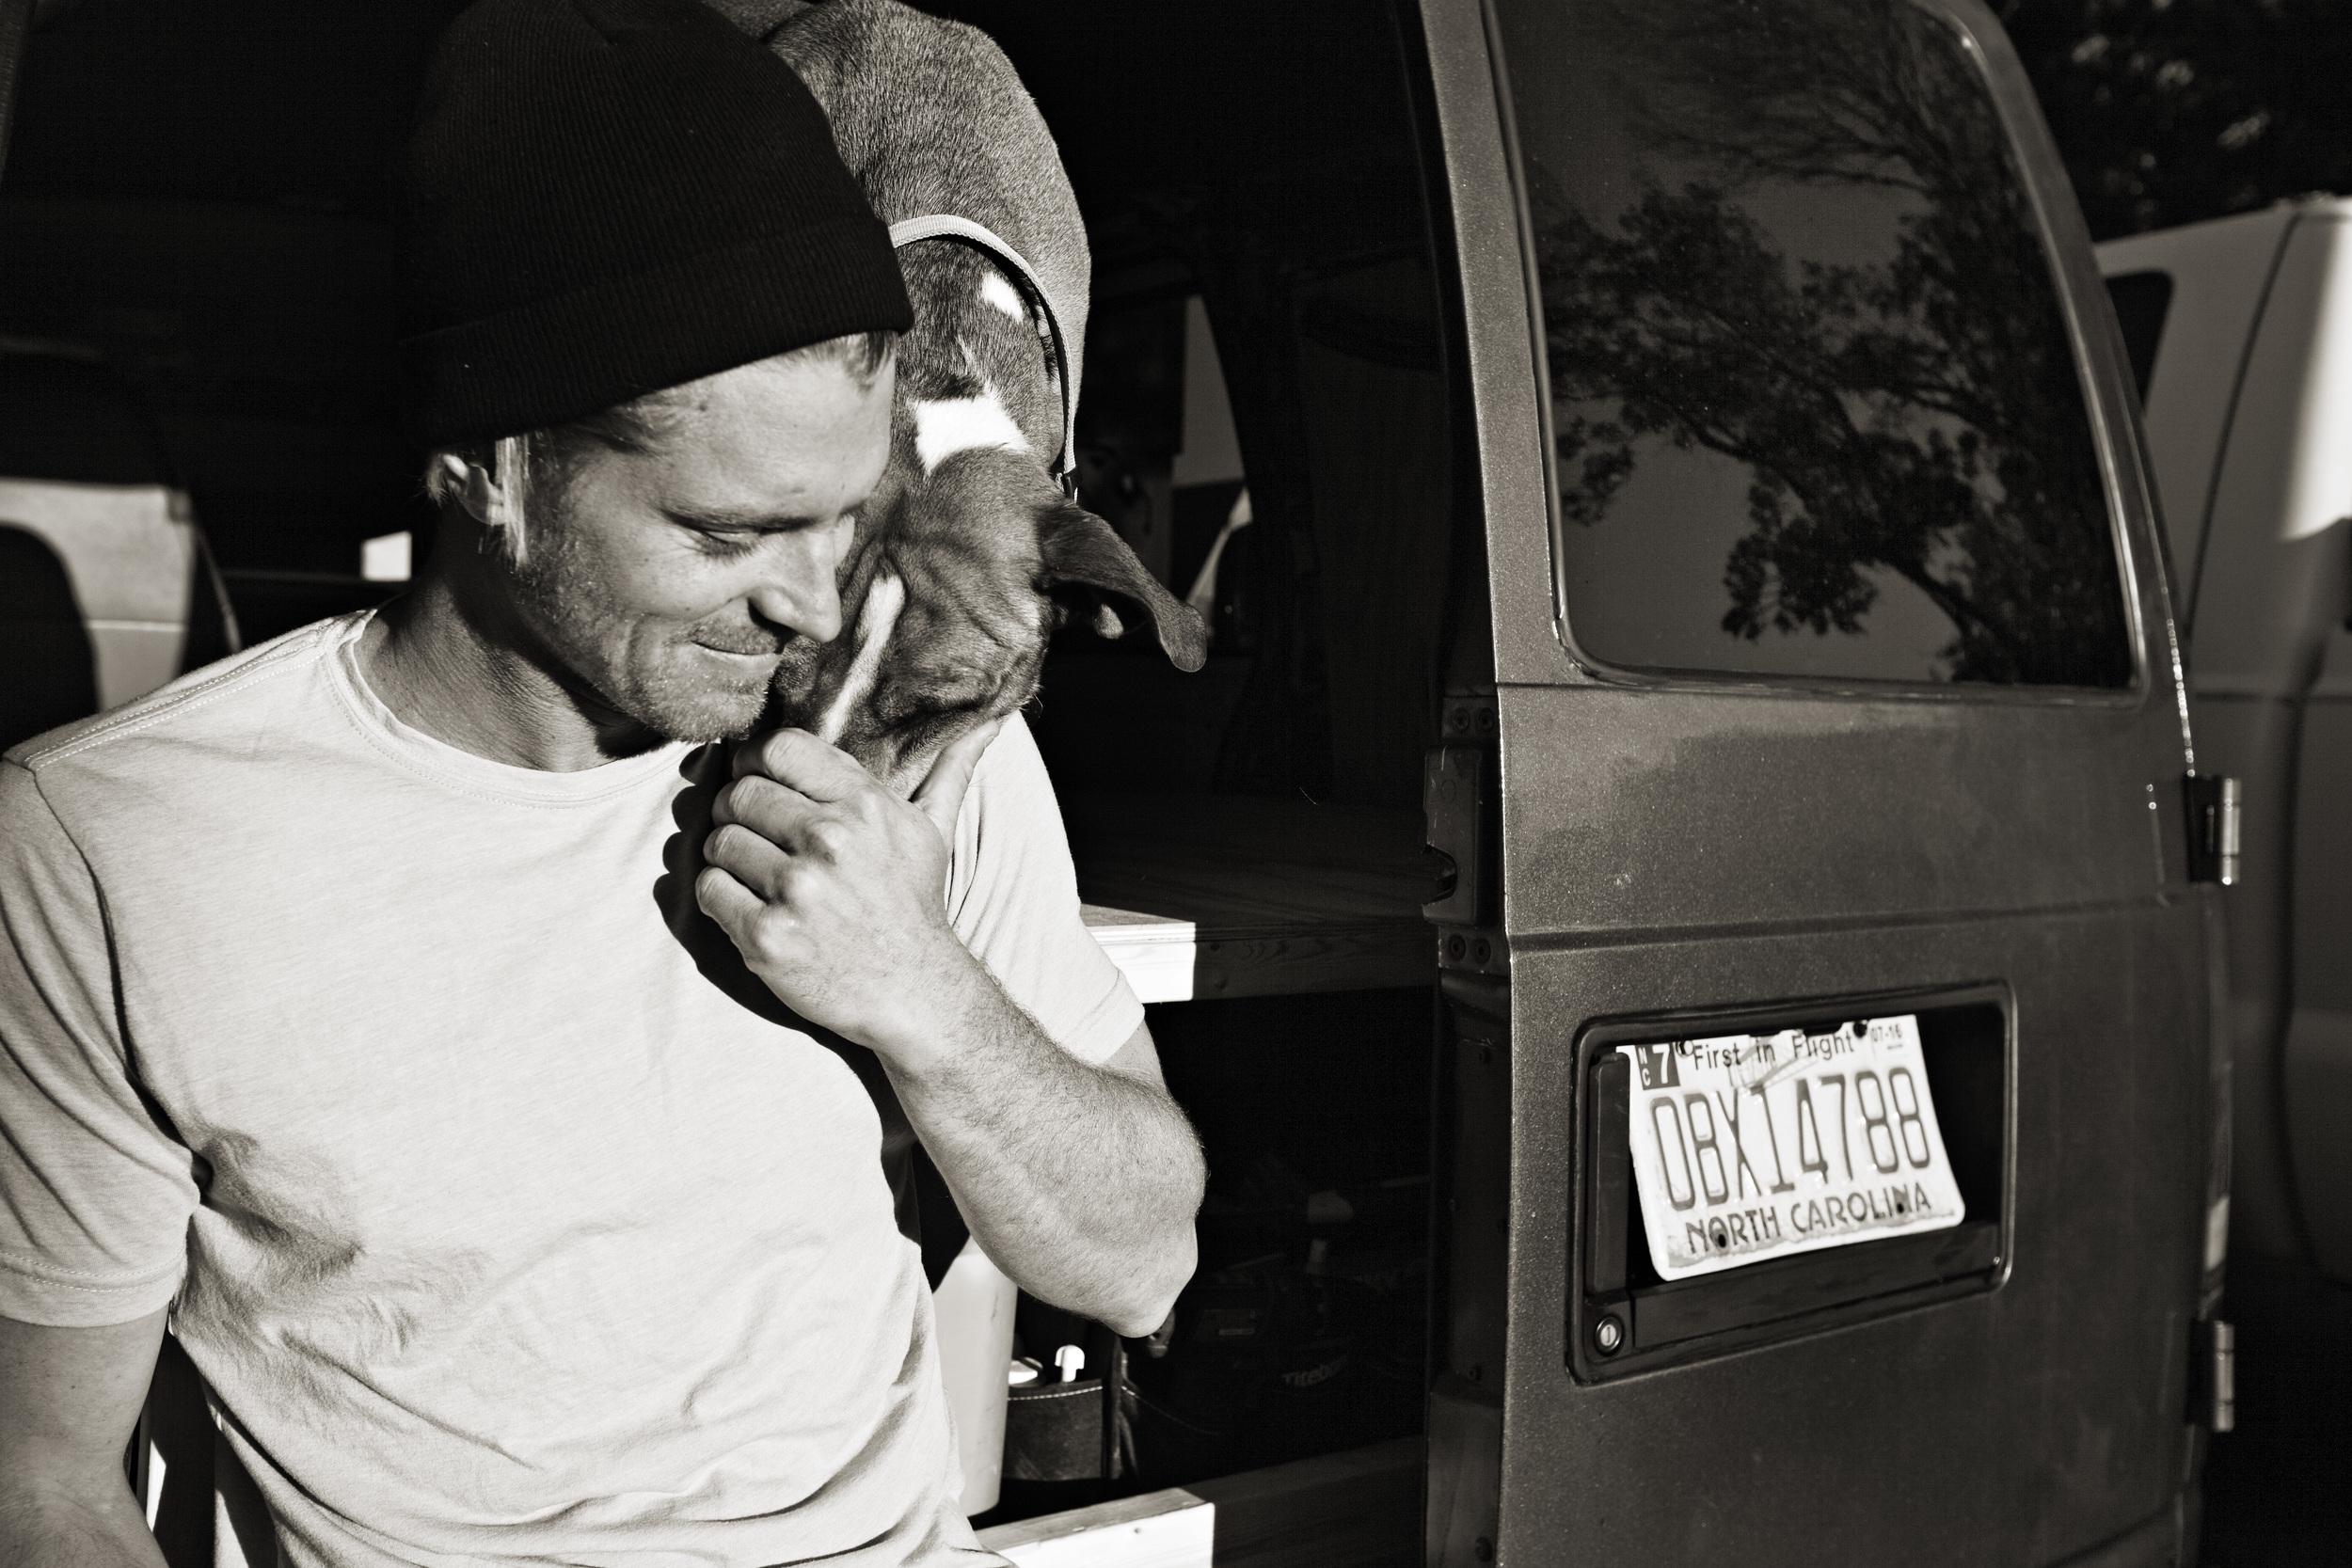 Dana, his buddy Stitch, and the van